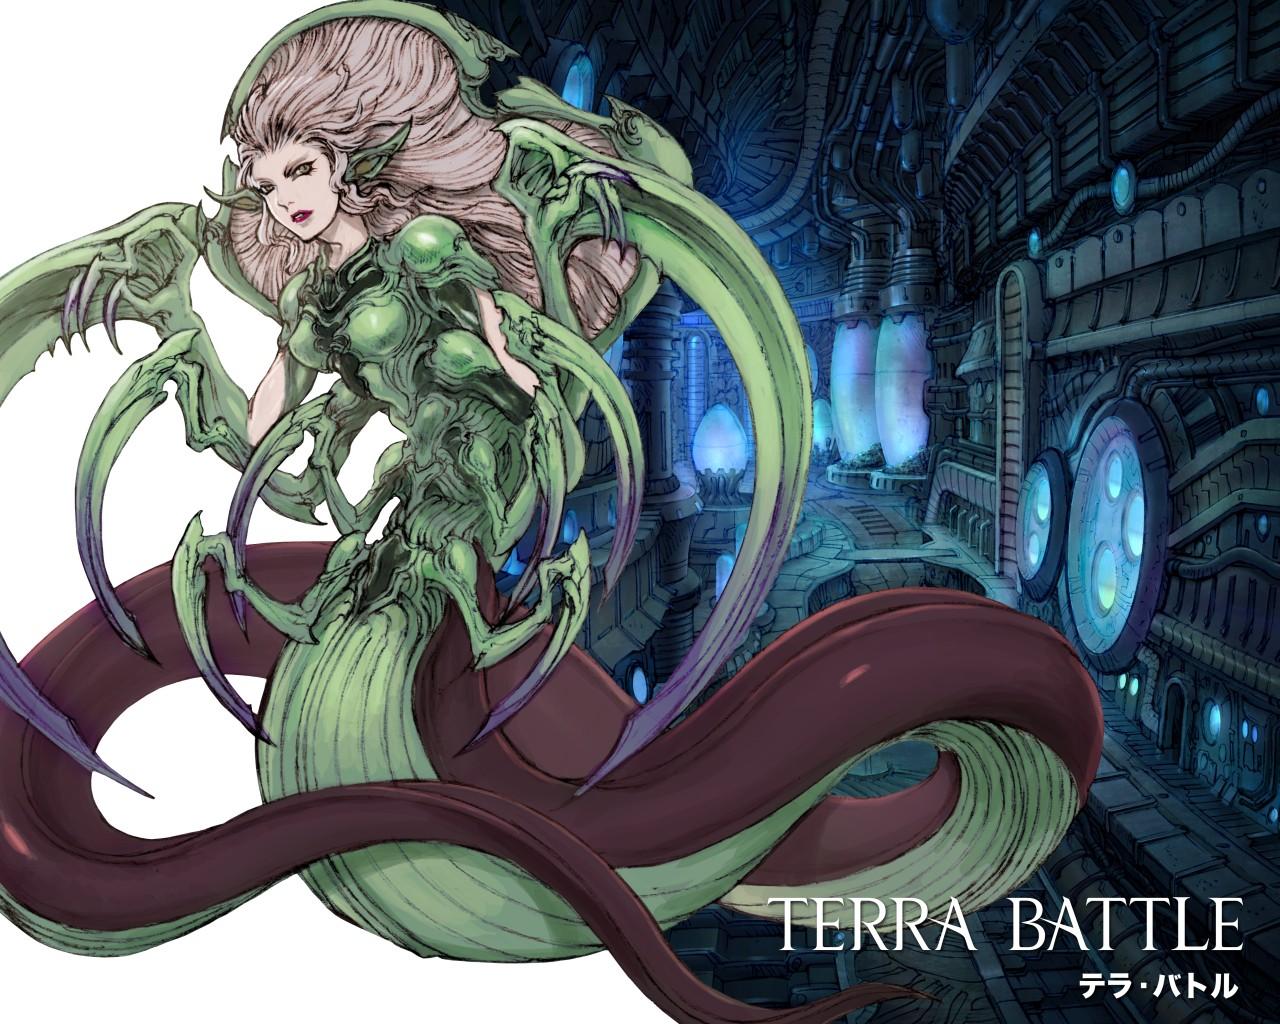 Terra-Battle_2014_08-27-14_024